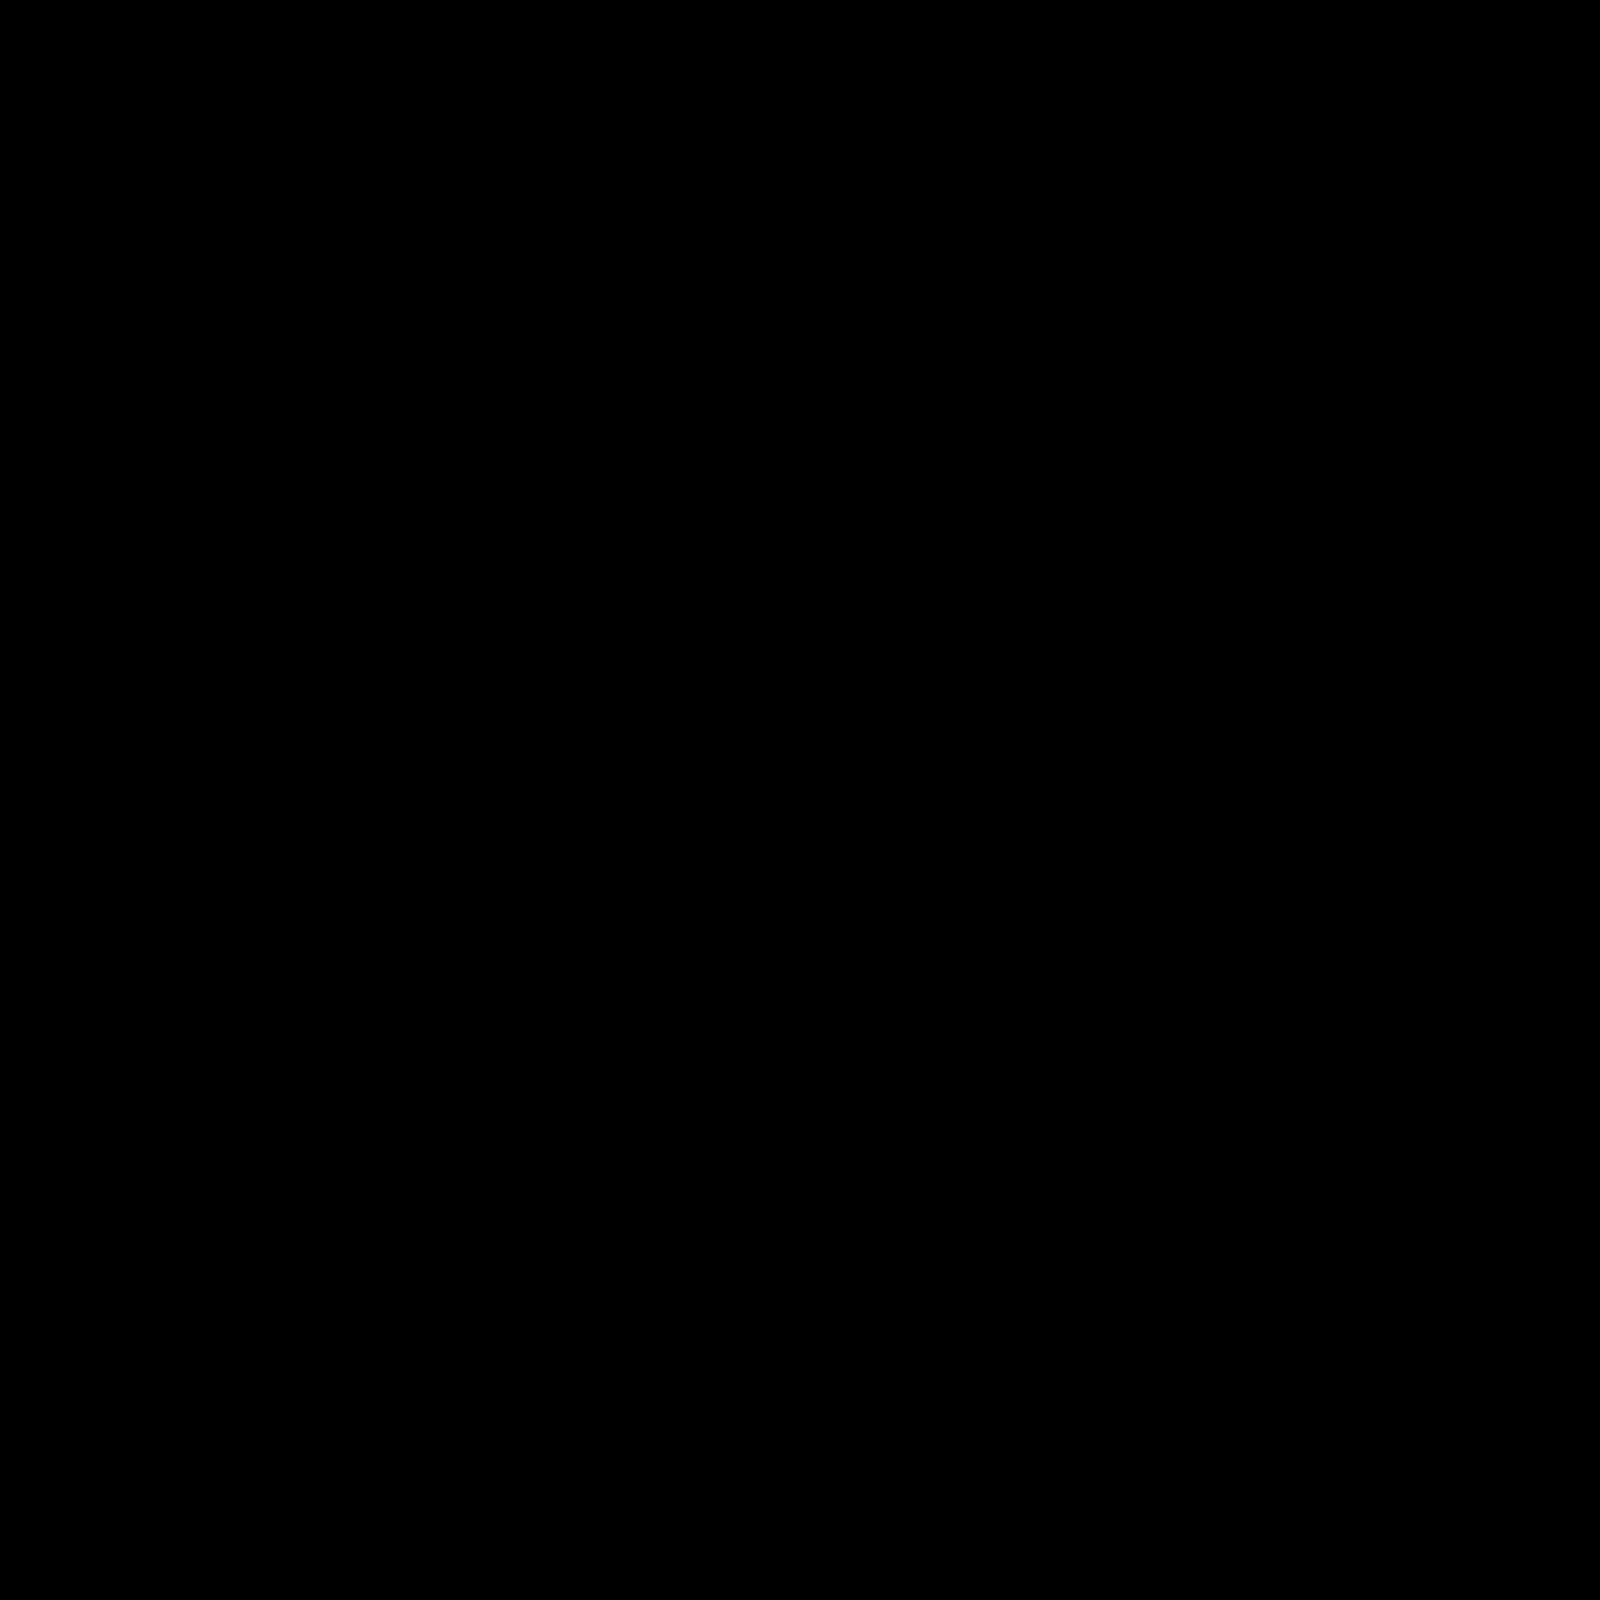 55 icon